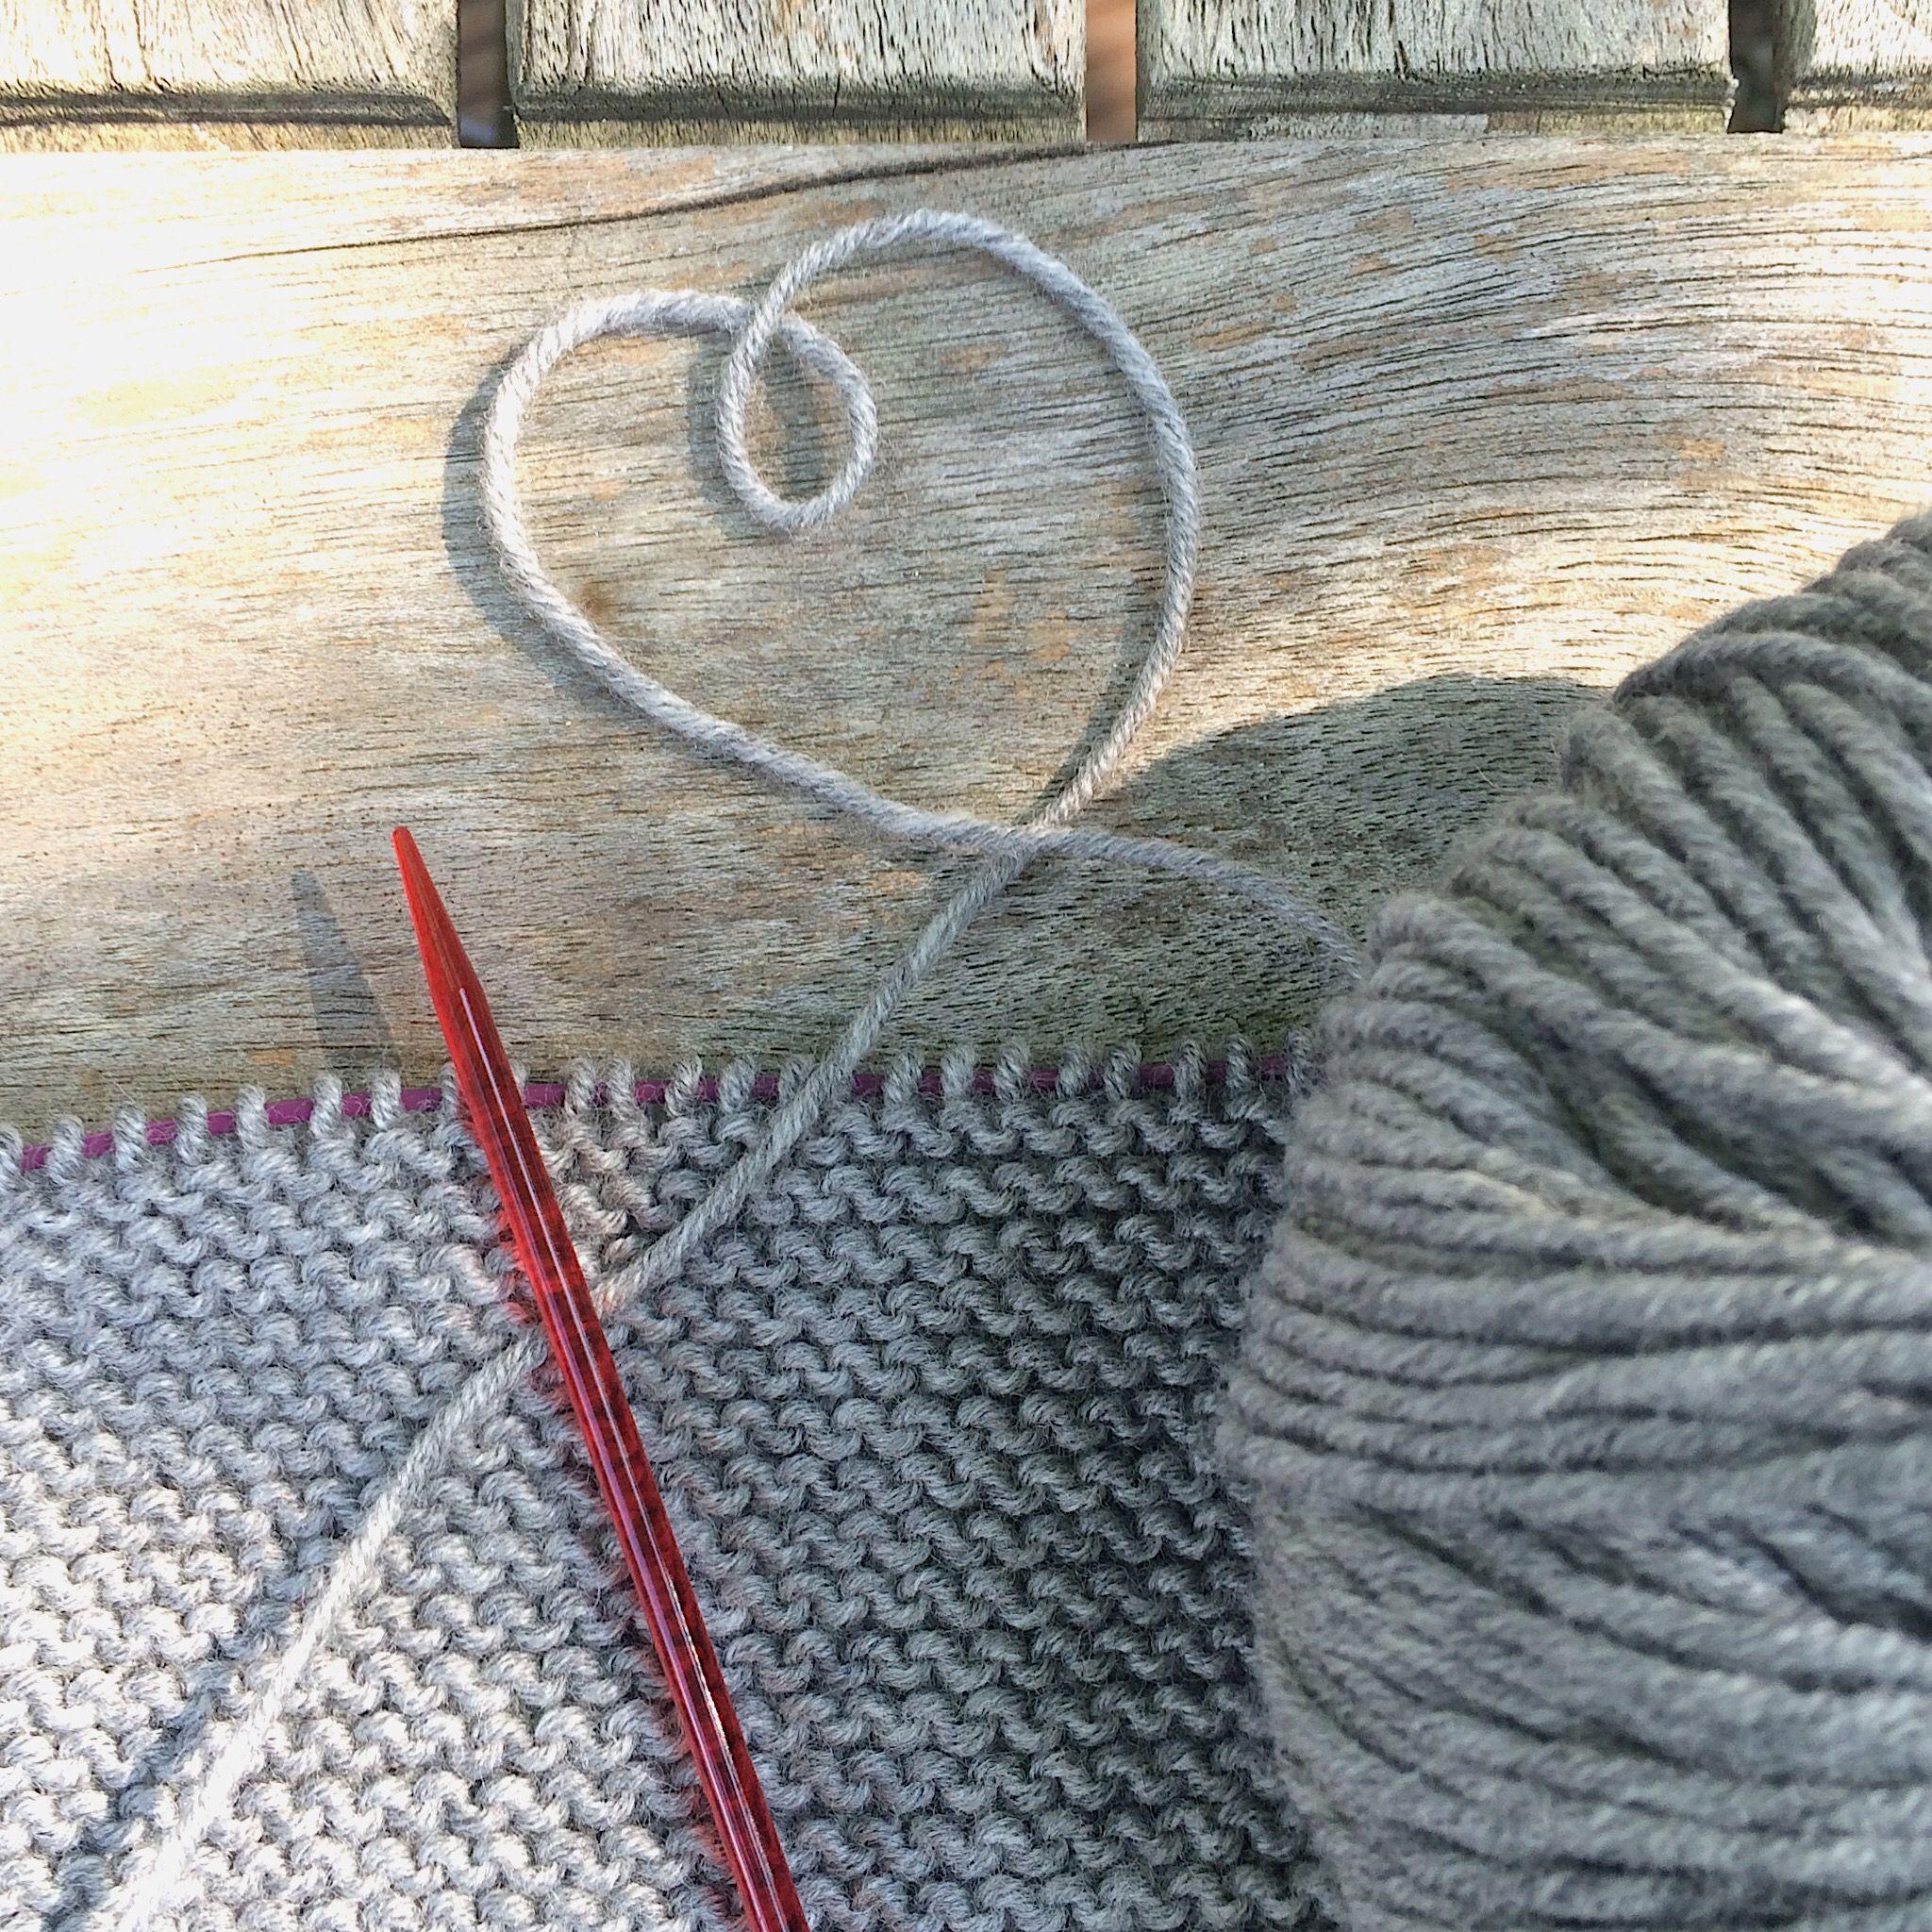 Anleitung Trachtentuch Dreieckstuch Dreitracht Stricken Knitting